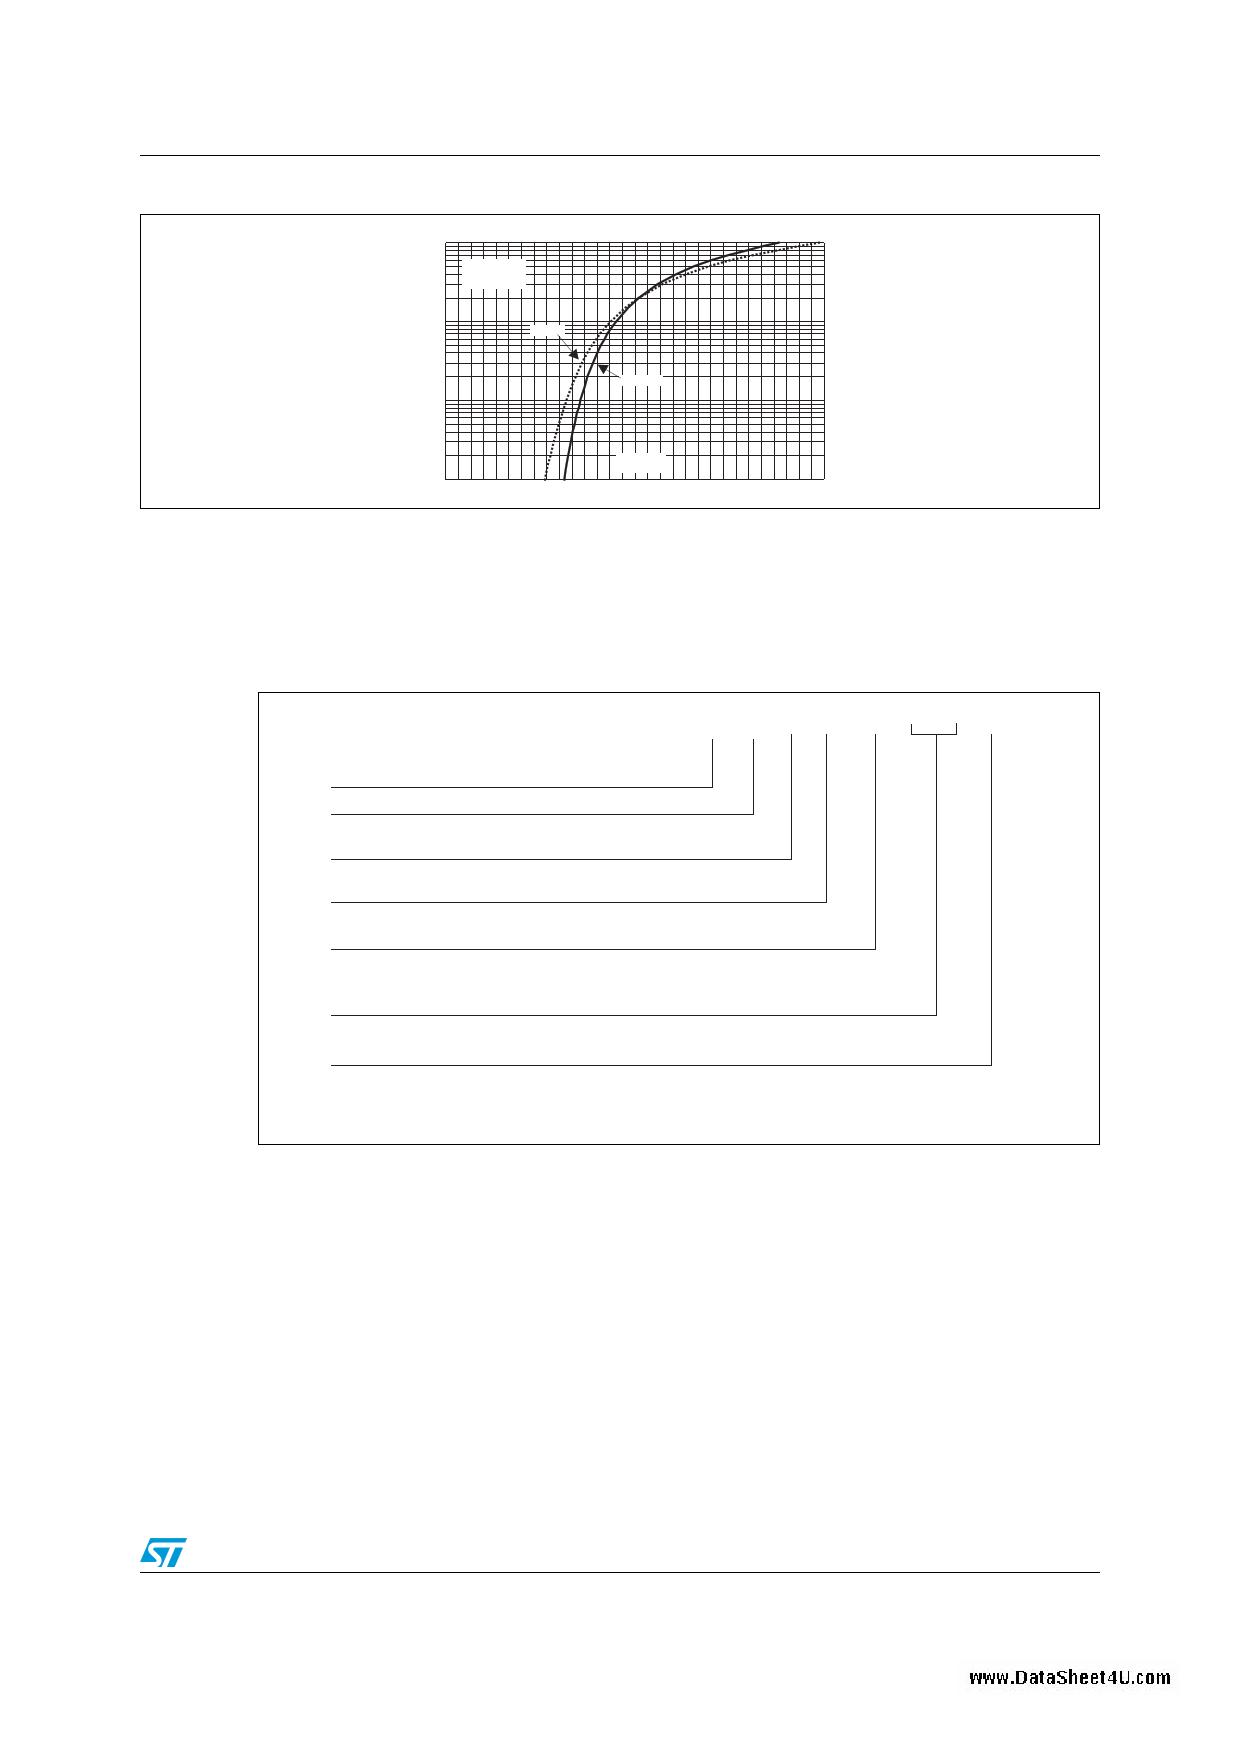 X00619 pdf, arduino